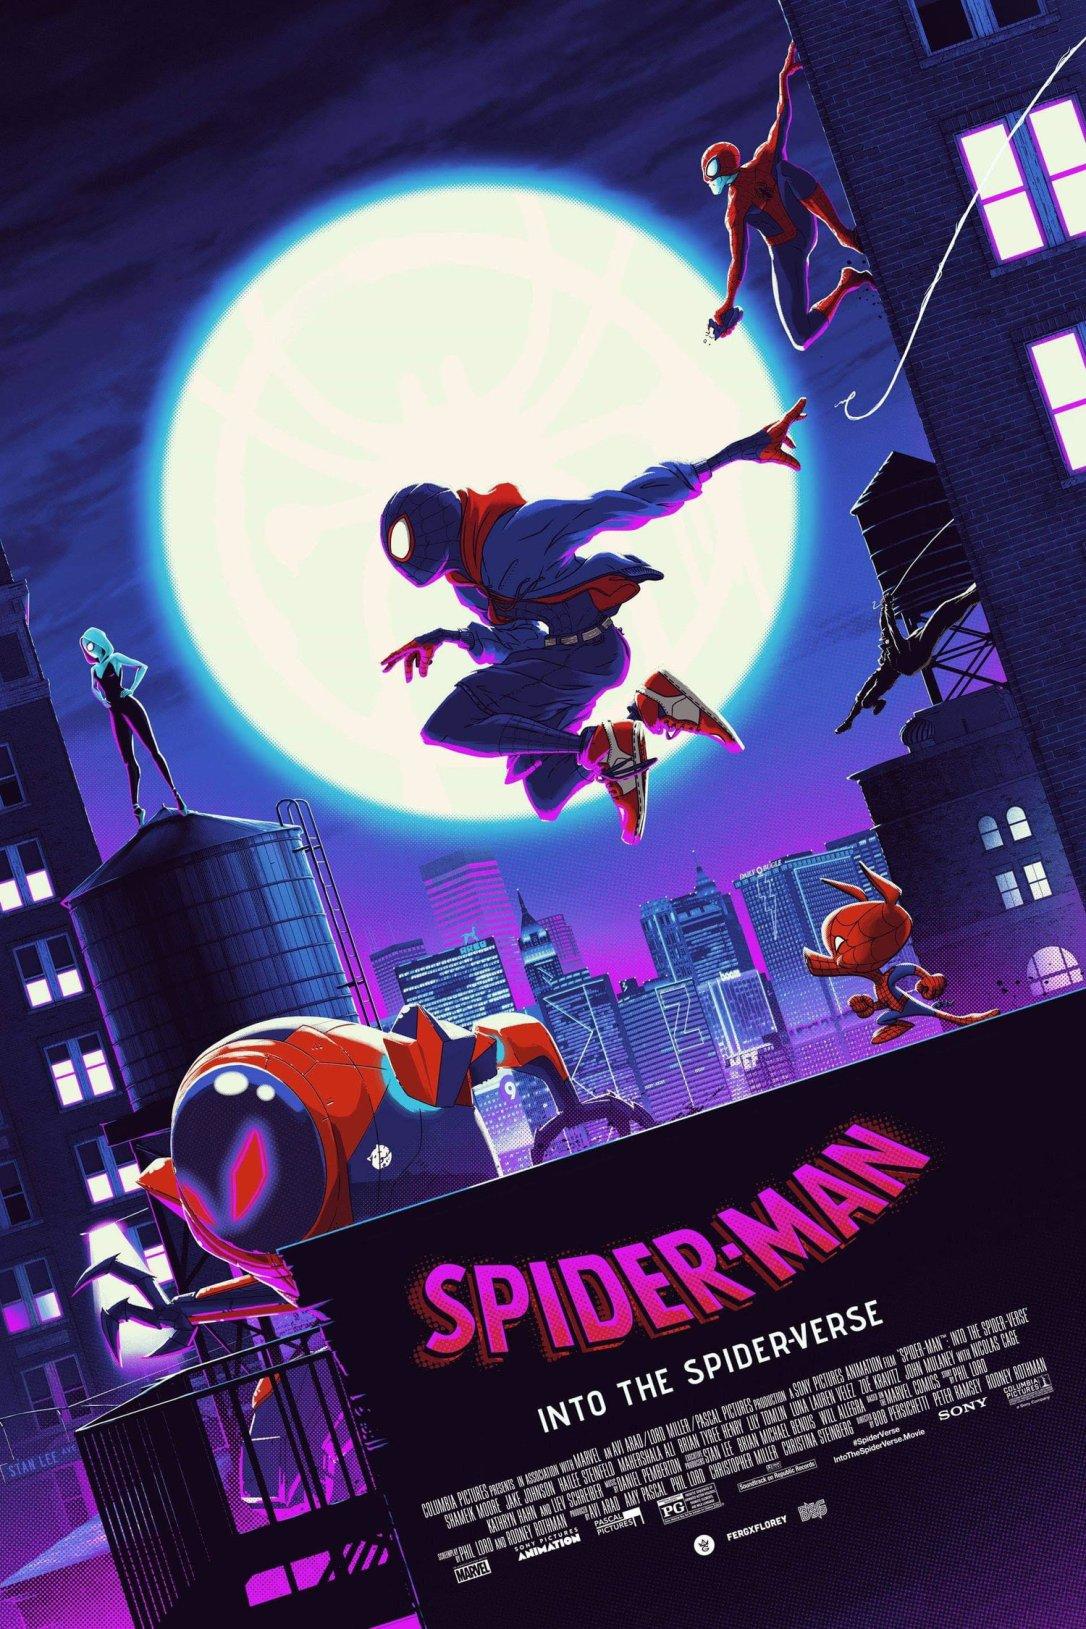 this-cool-spider-man-into-the-spider-verse-poster-art-from-matt-ferguson-glows-in-the-dark1